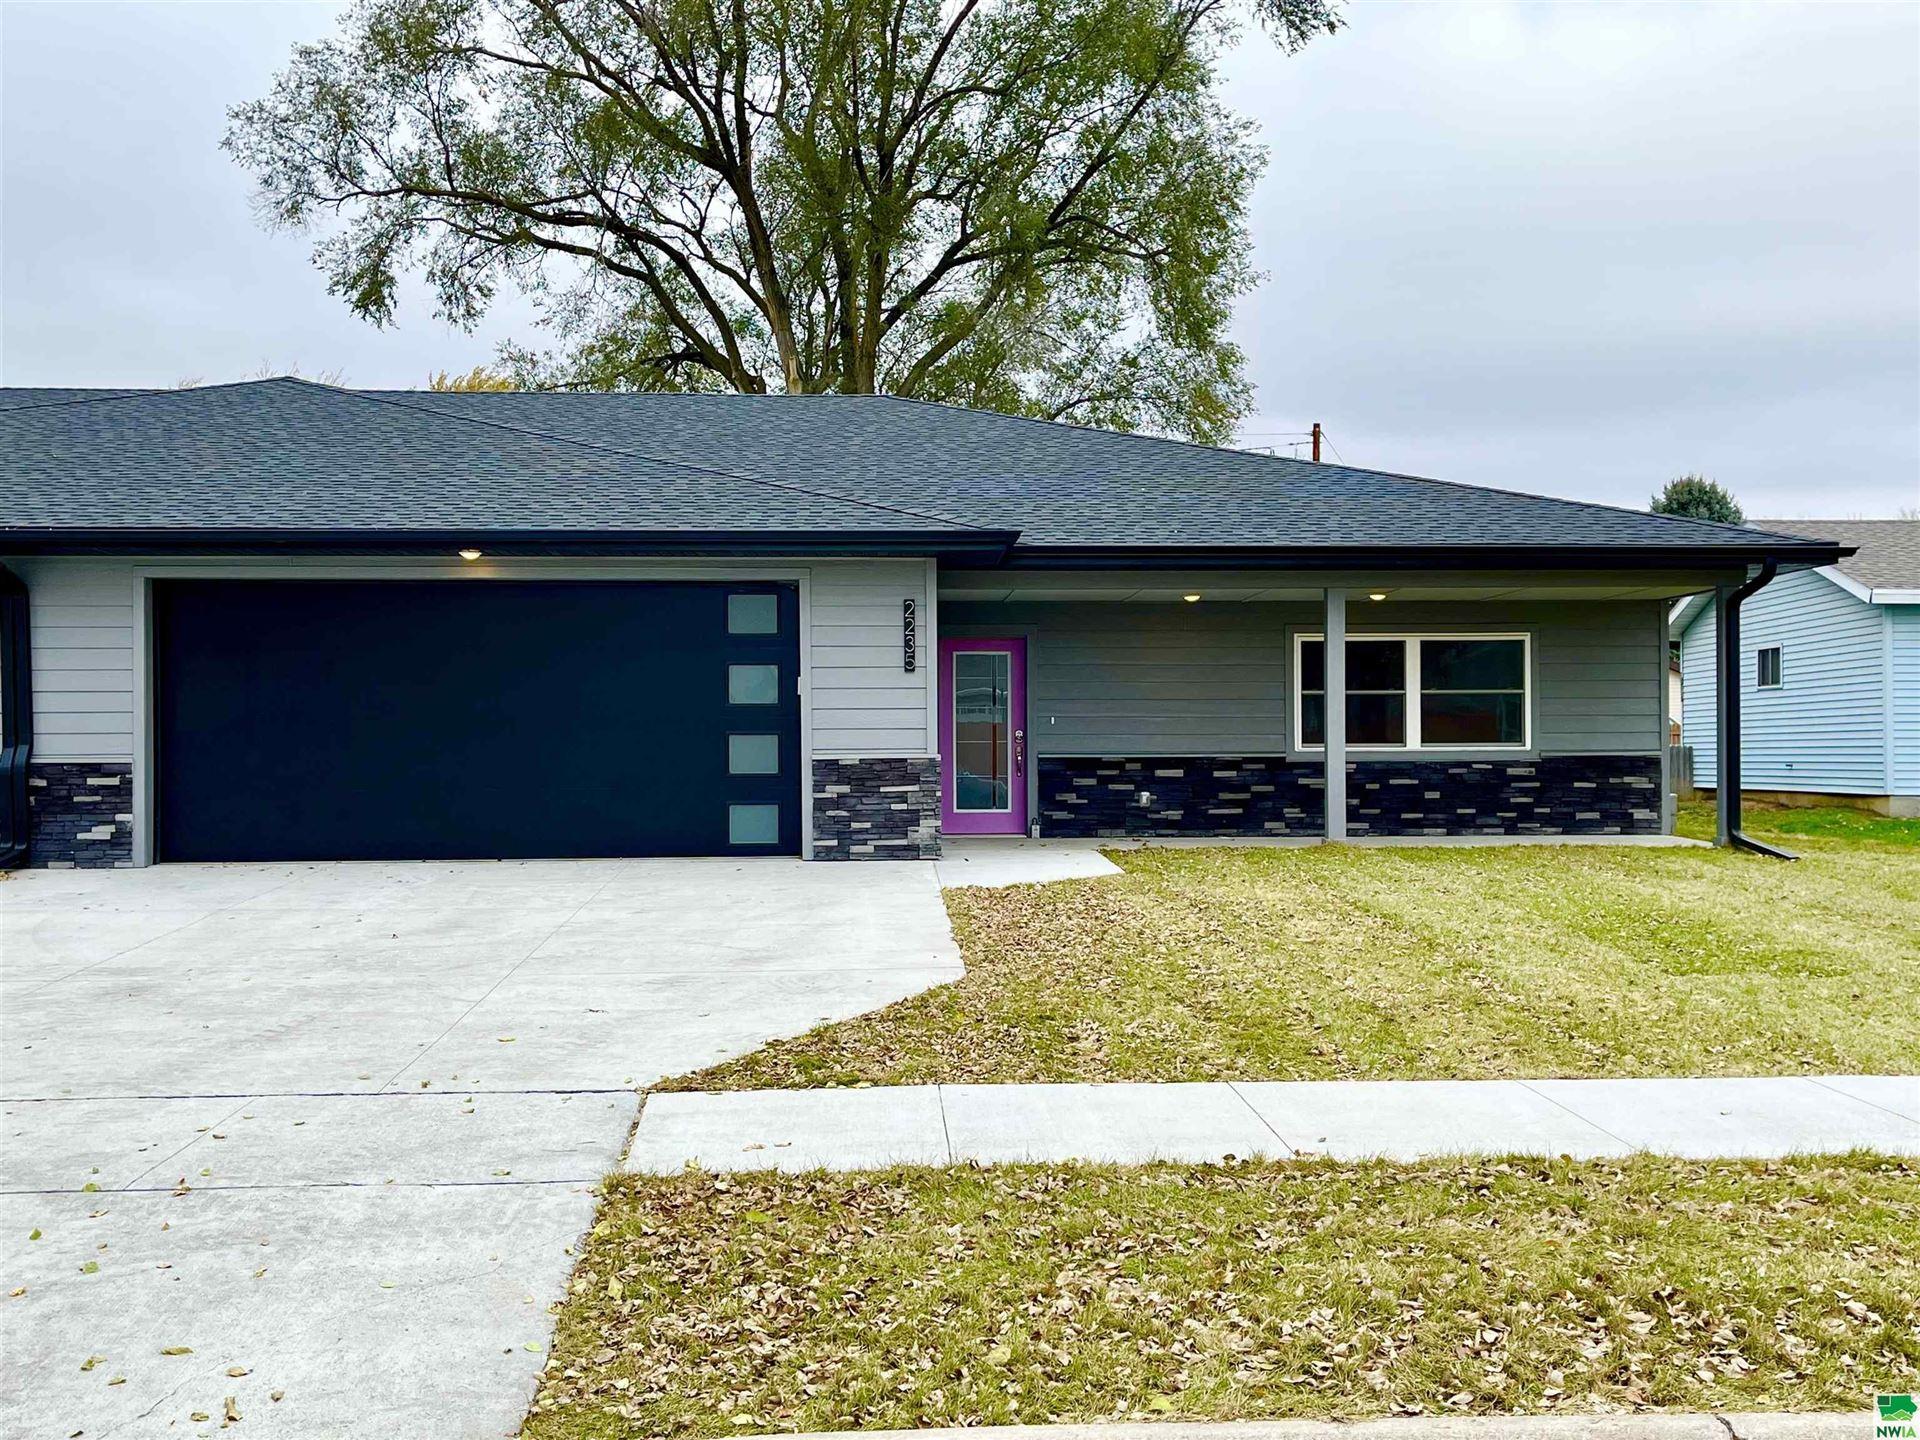 Photo for 2235 Dewey Street, Sioux City, IA 51109 (MLS # 814134)